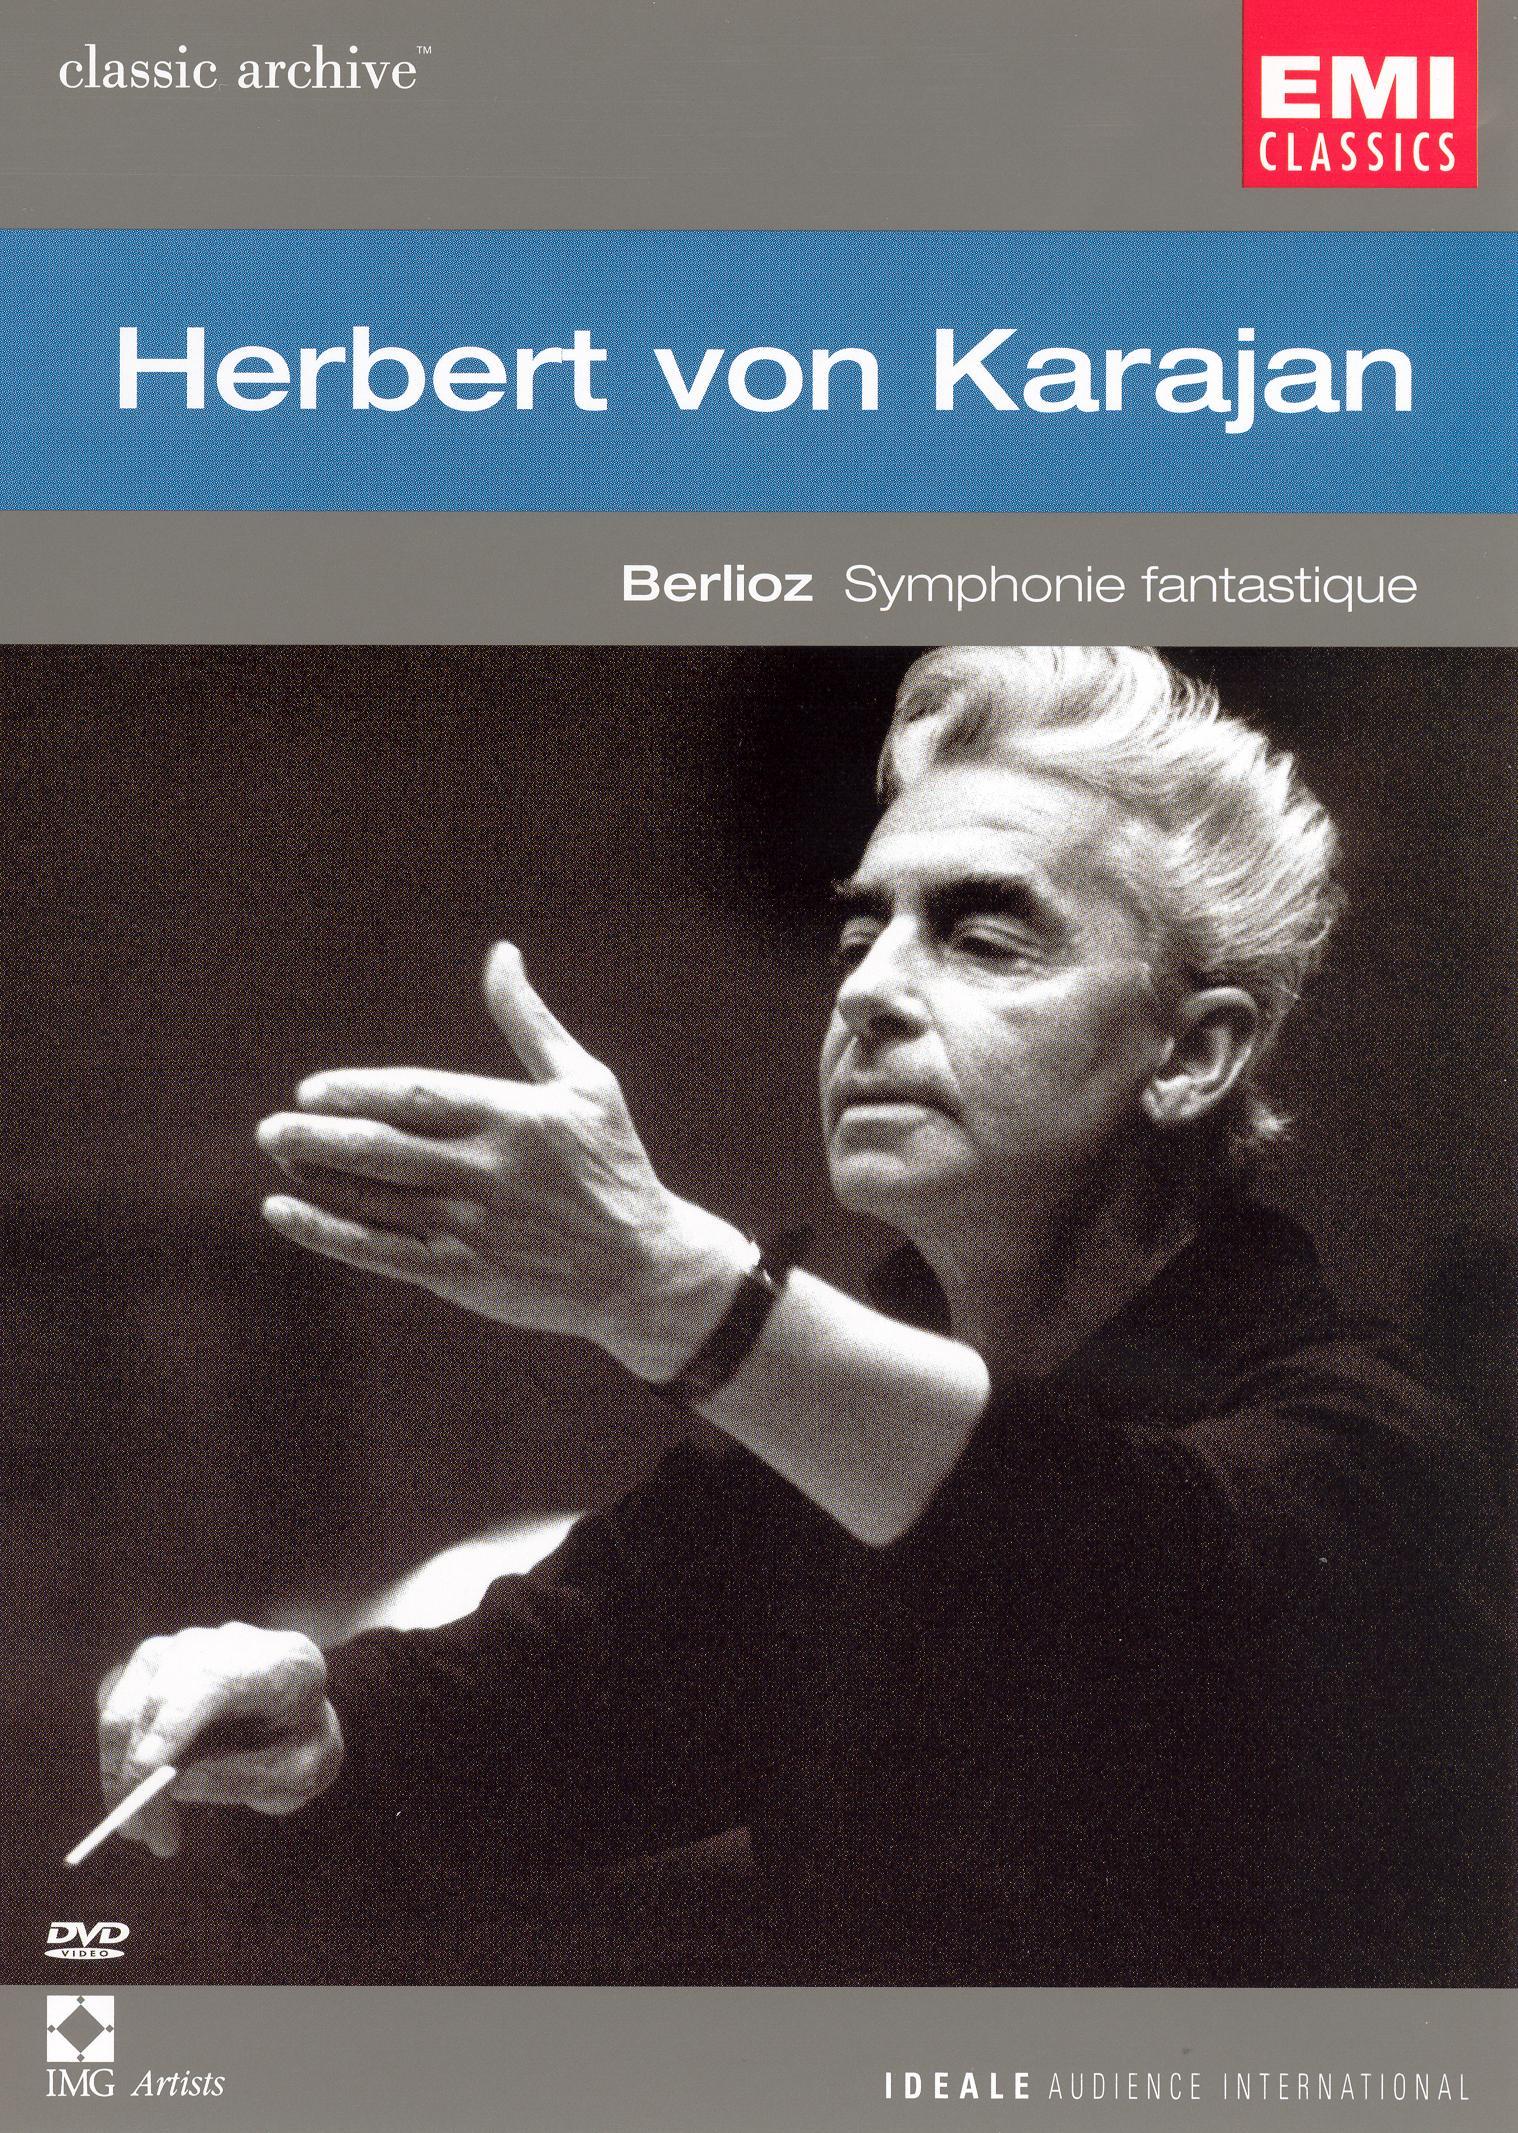 Classic Archives: Herbert Von Karajan - Berlioz Symphonie Fantastique